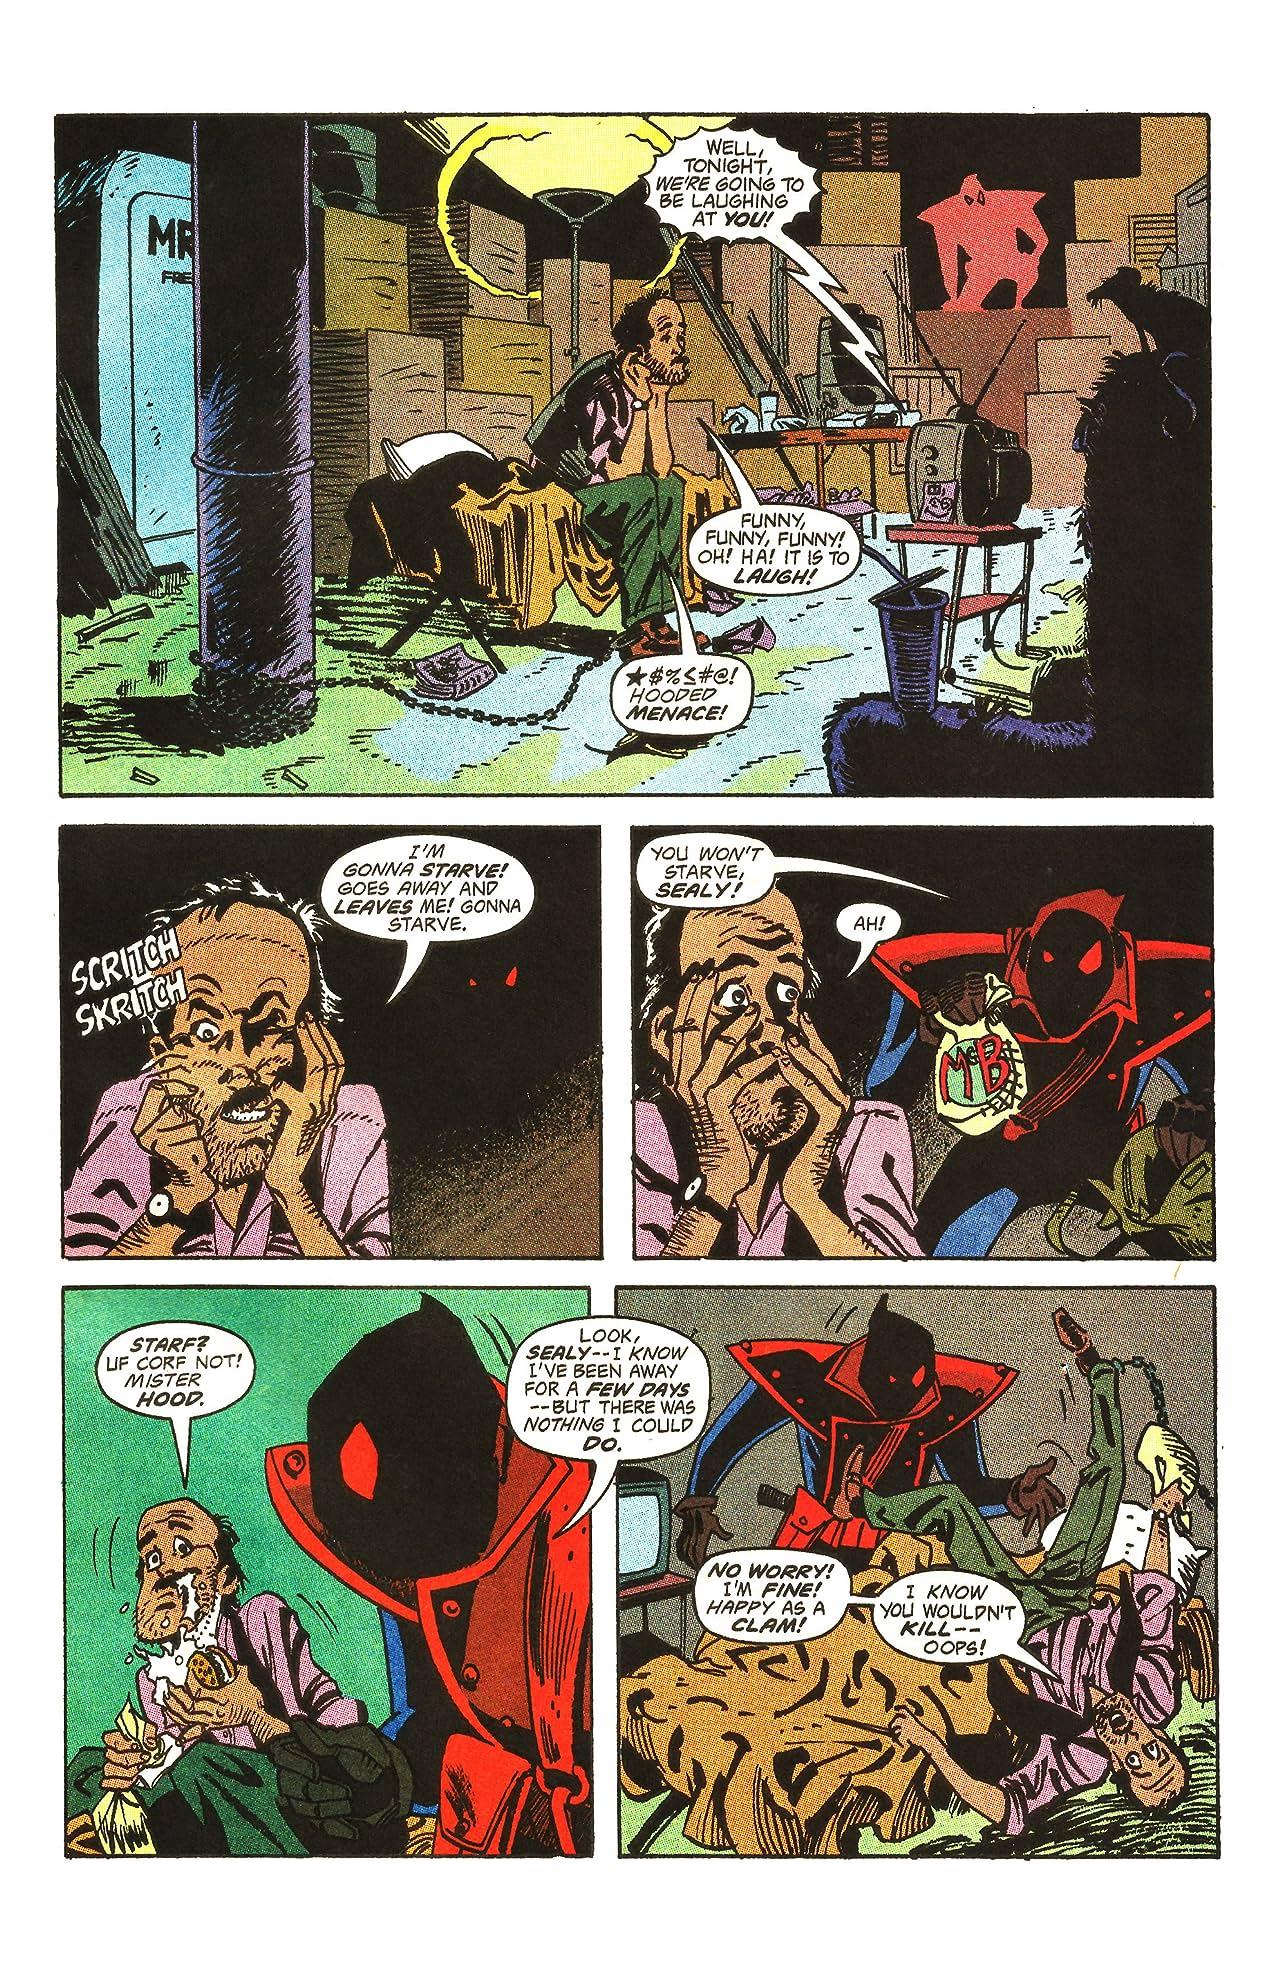 The Black Hood (Impact Comics) #8